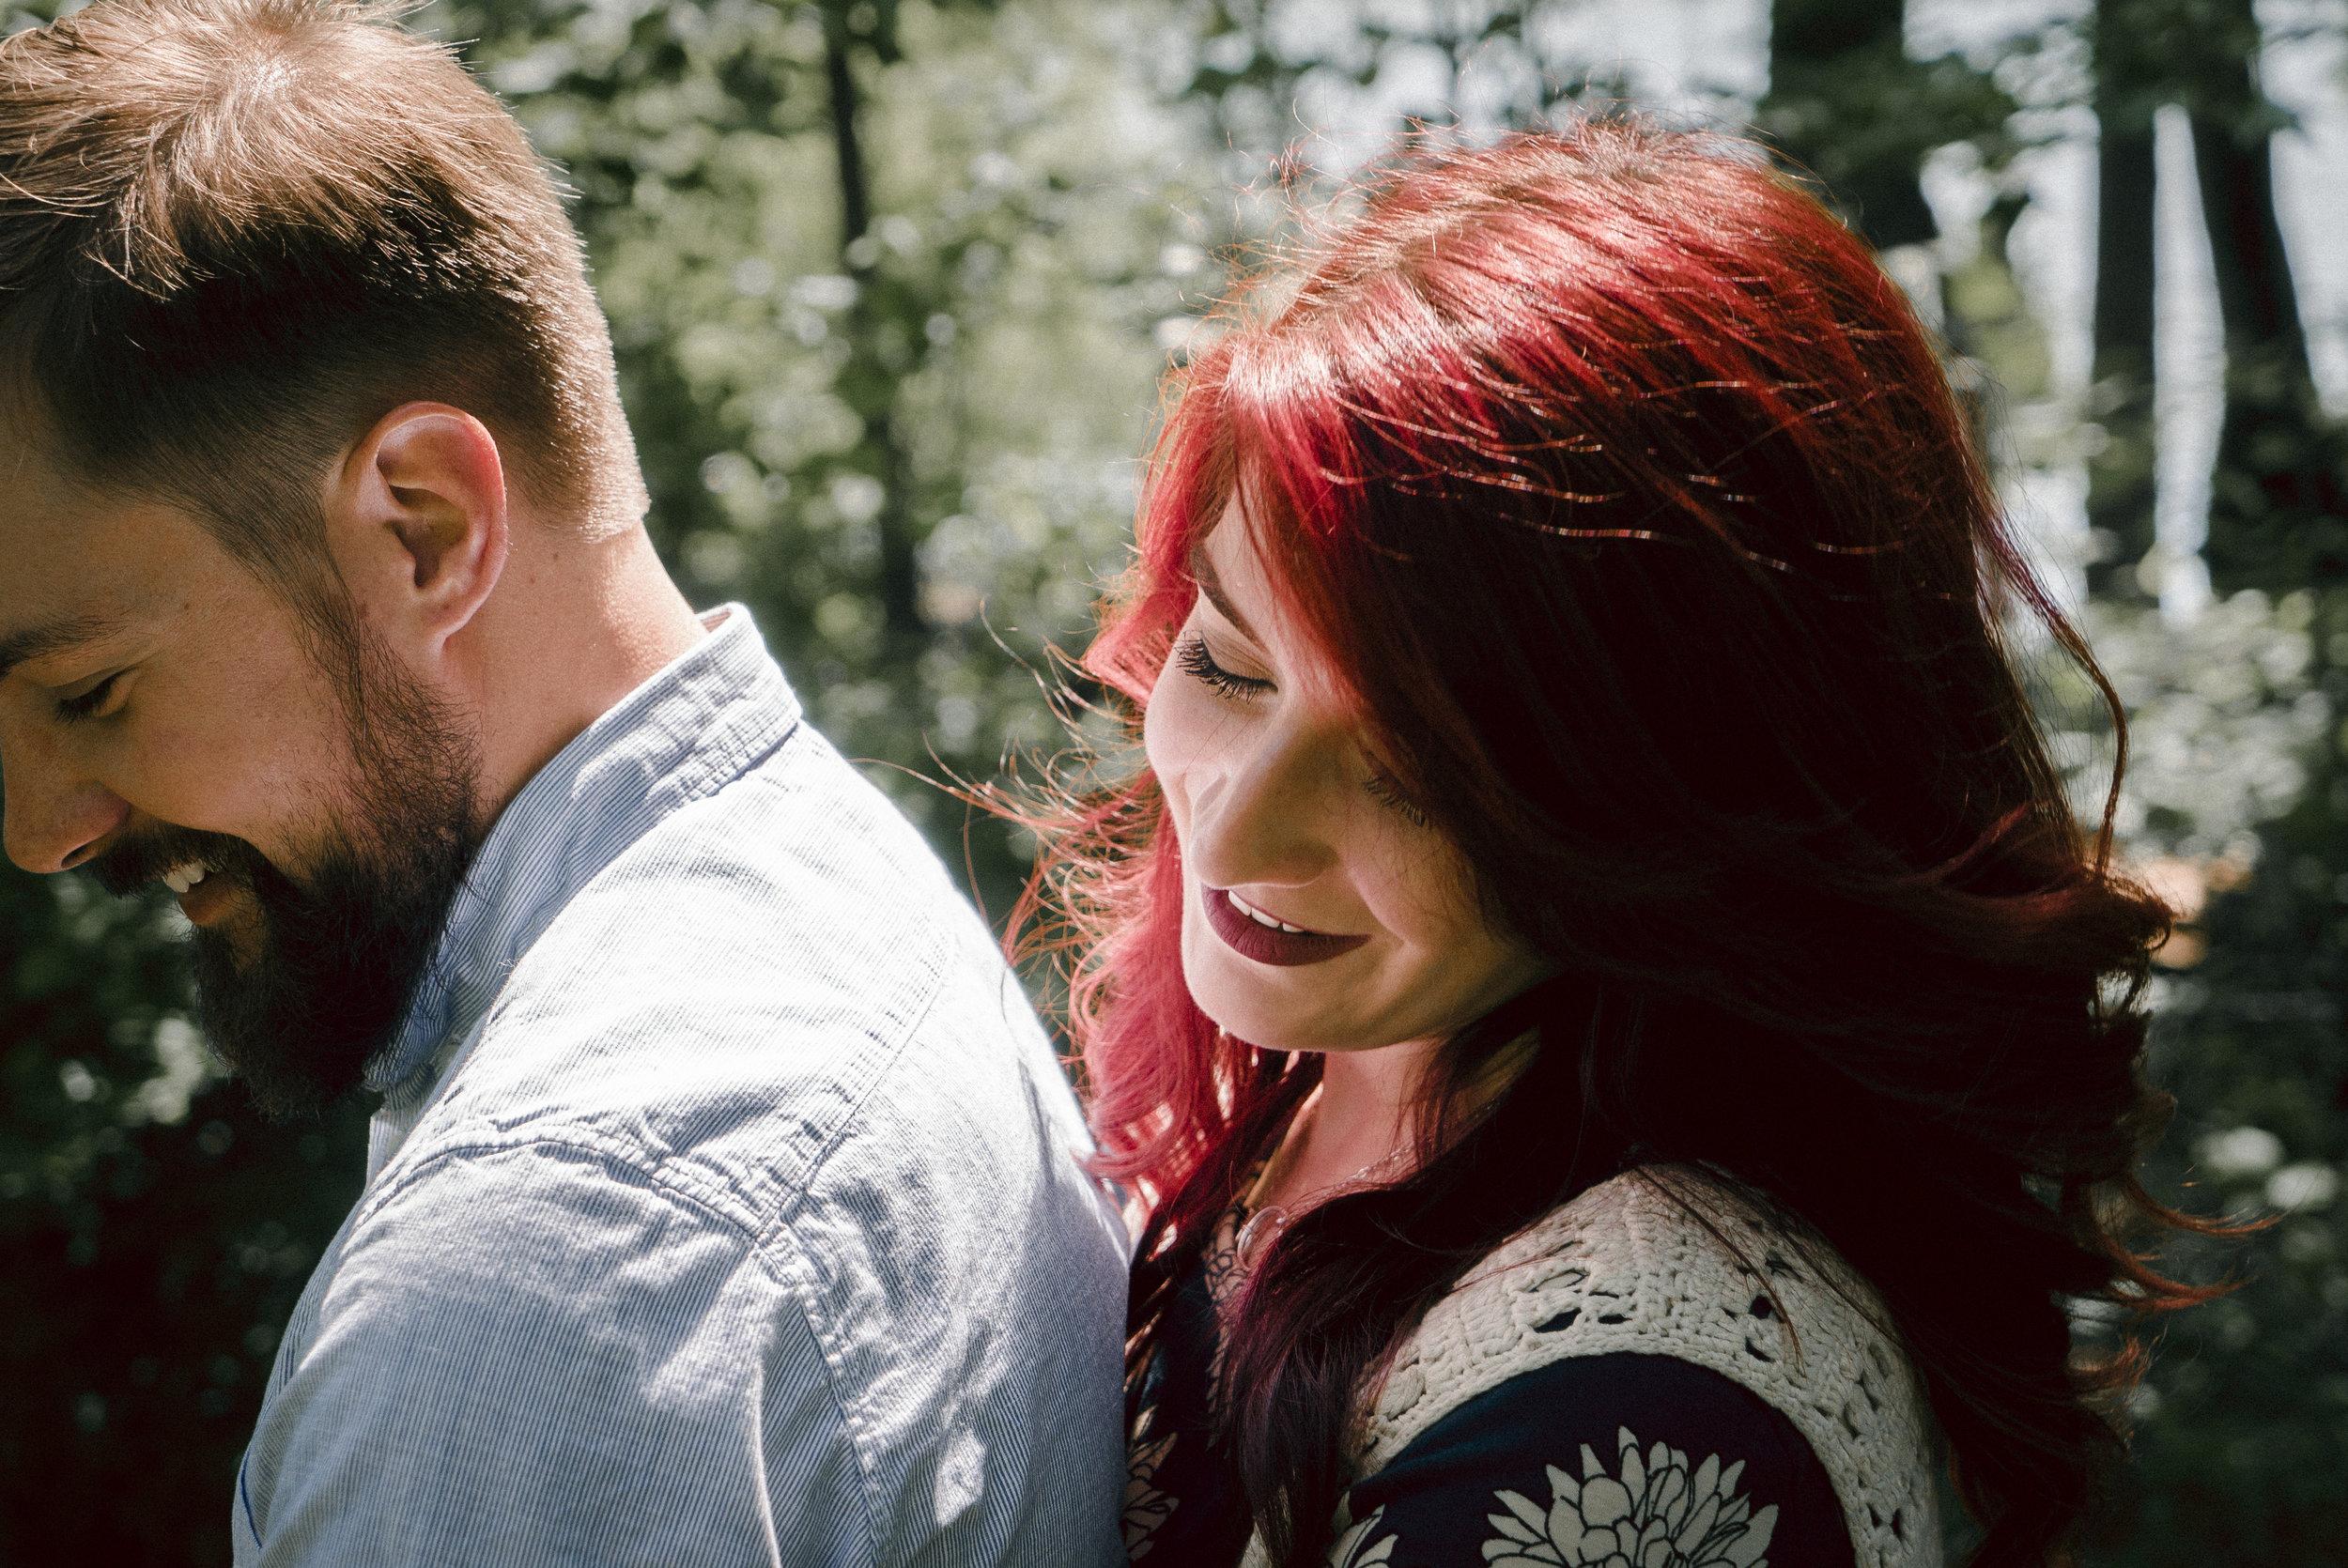 Sean & Amber - Engagement photos shot at Stumpy Lake in Virginia Beach, Virginia